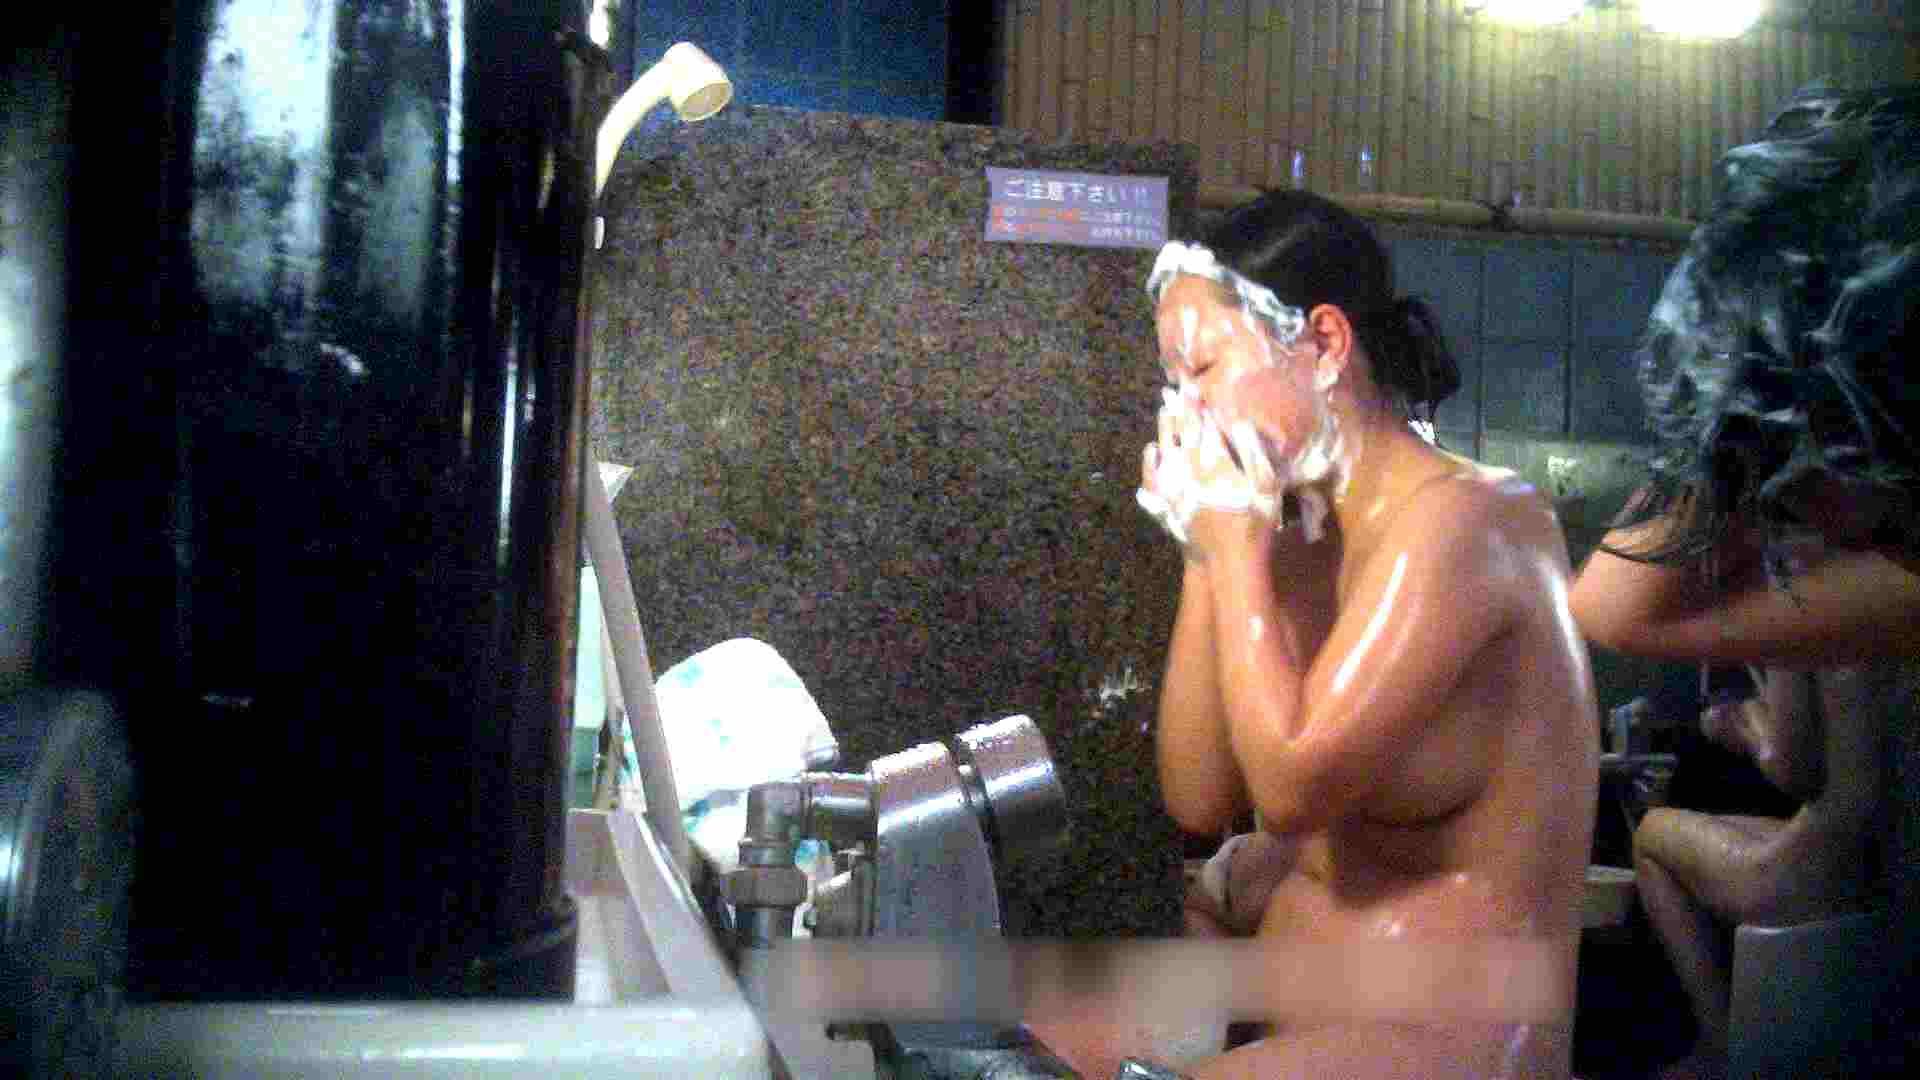 TG.08 【一等兵】陰毛の向こう側にむっちりちょいブサお嬢さん 女風呂 AV無料動画キャプチャ 78枚